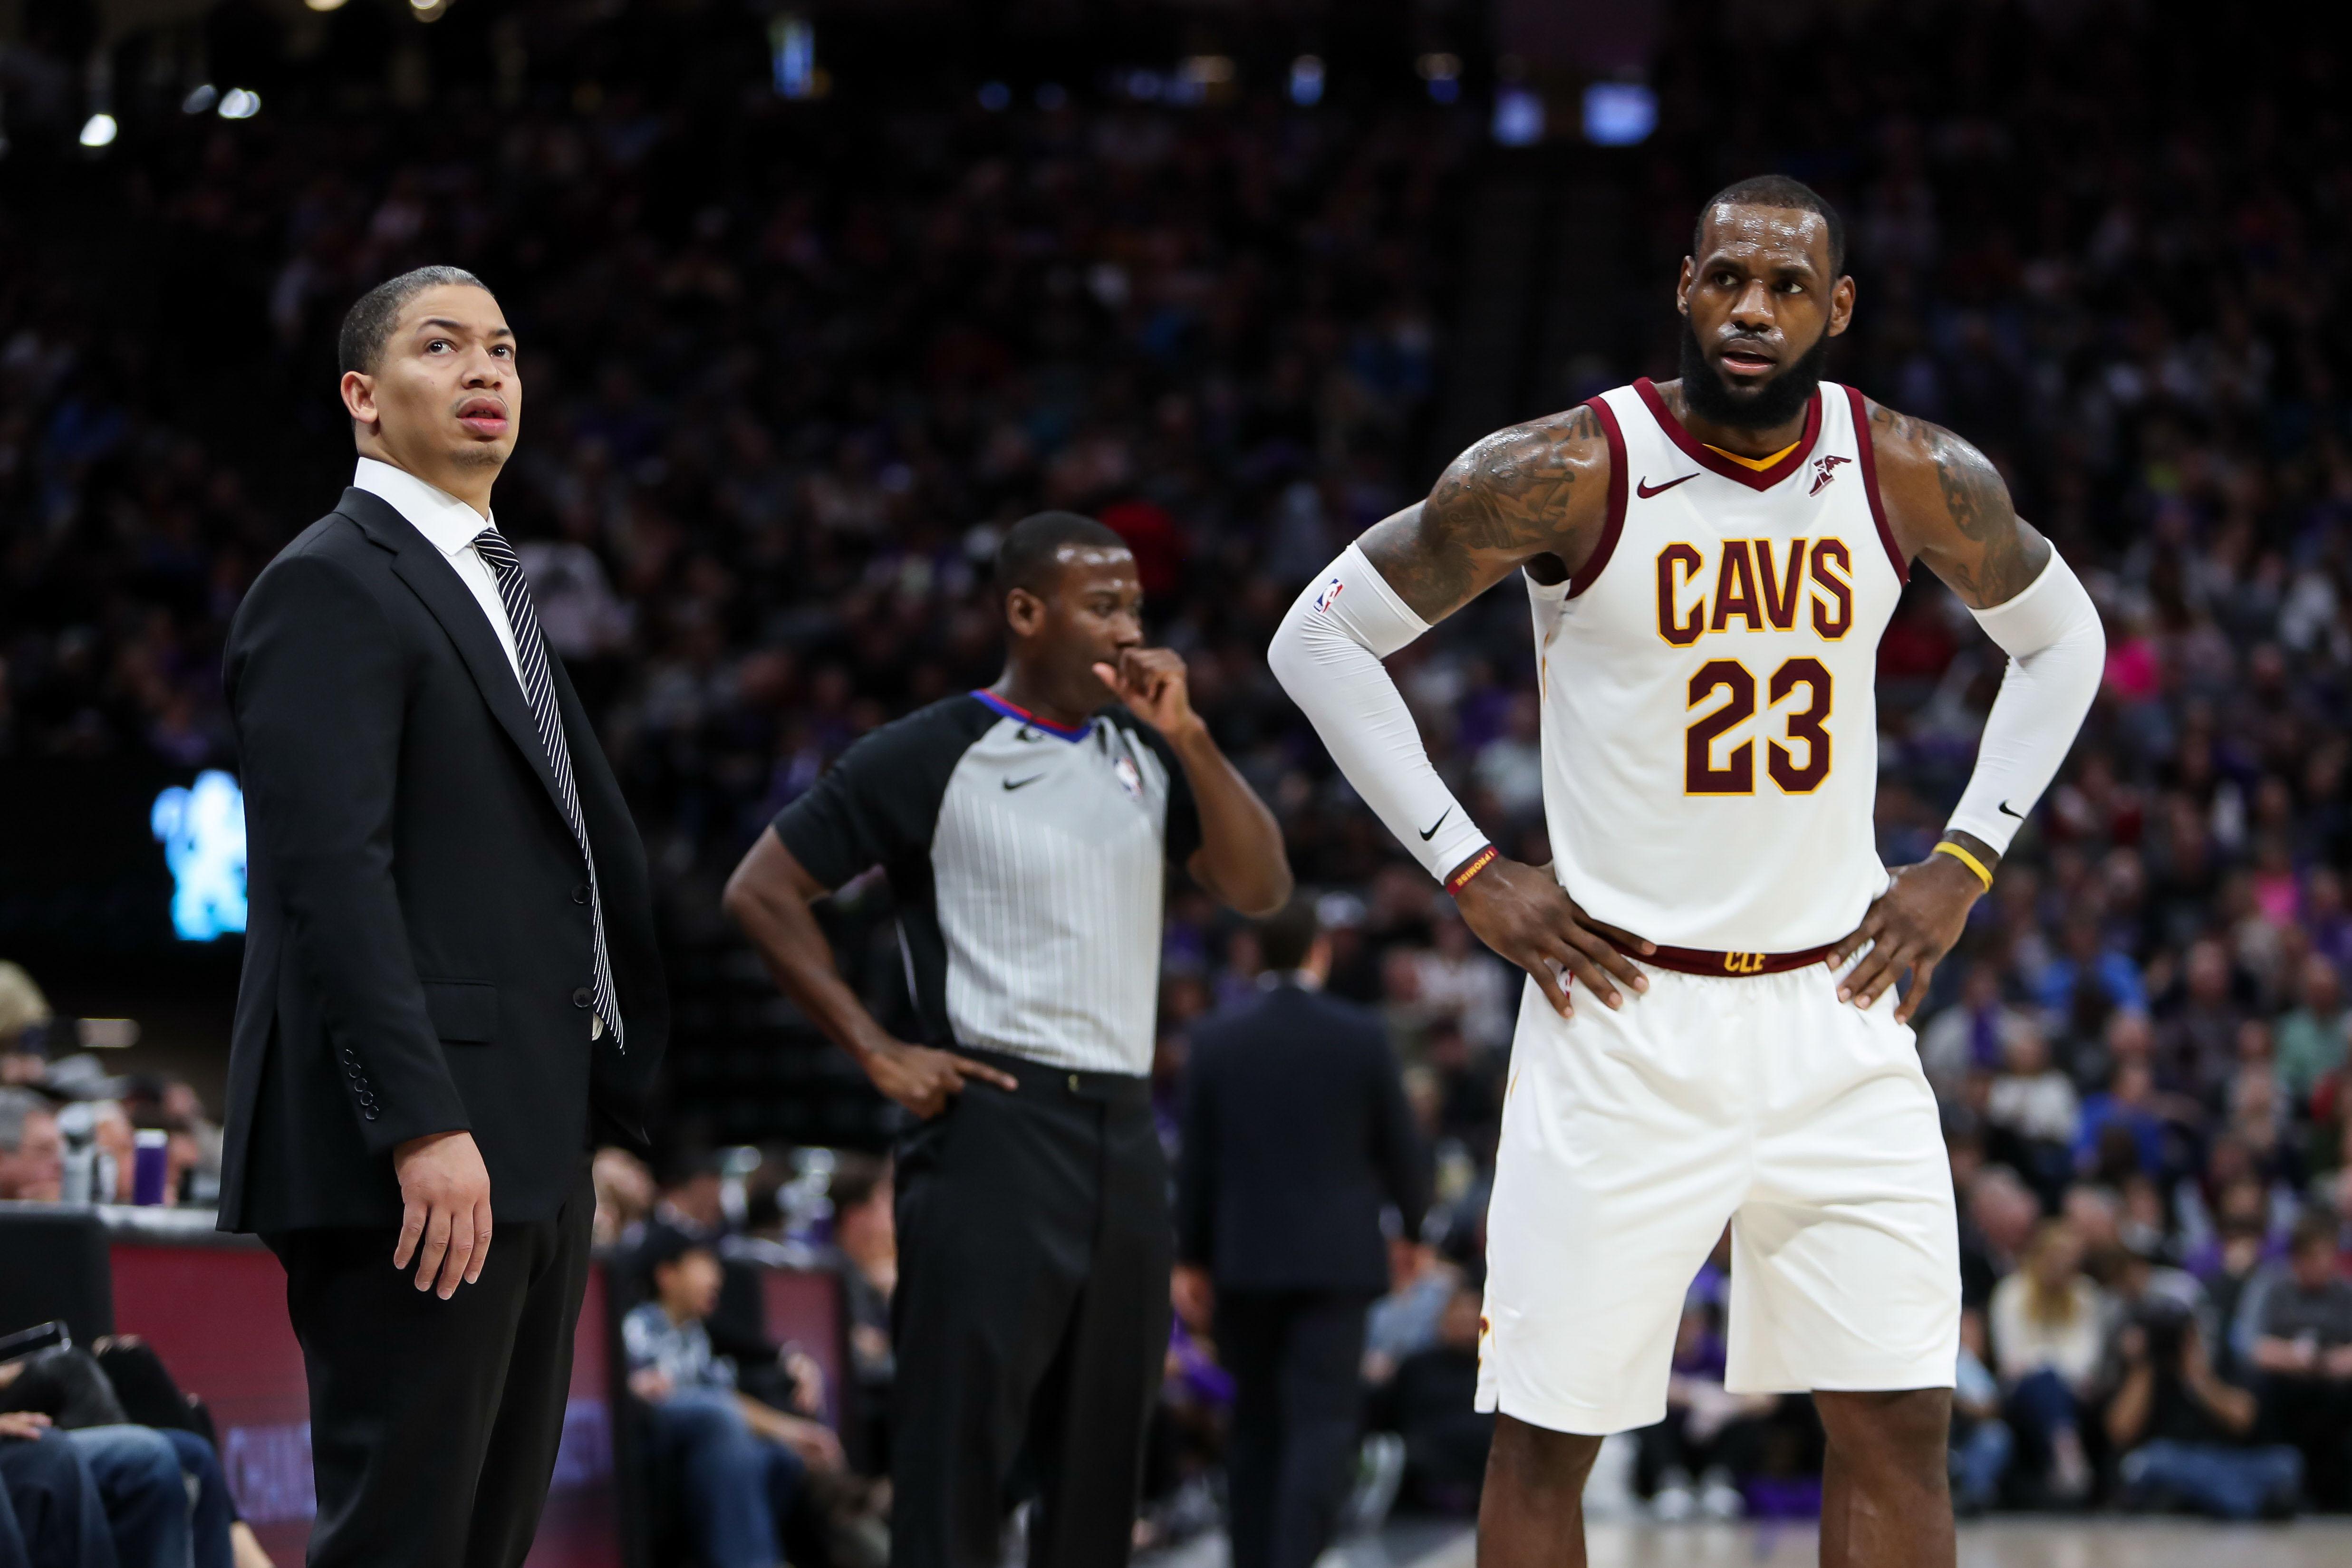 23c1c3d0e17 Dec 27, 2017; Sacramento, CA, USA; Cleveland Cavaliers forward LeBron James  (23) and head coach Tyronn Lue during the game against the Sacramento Kings  at ...